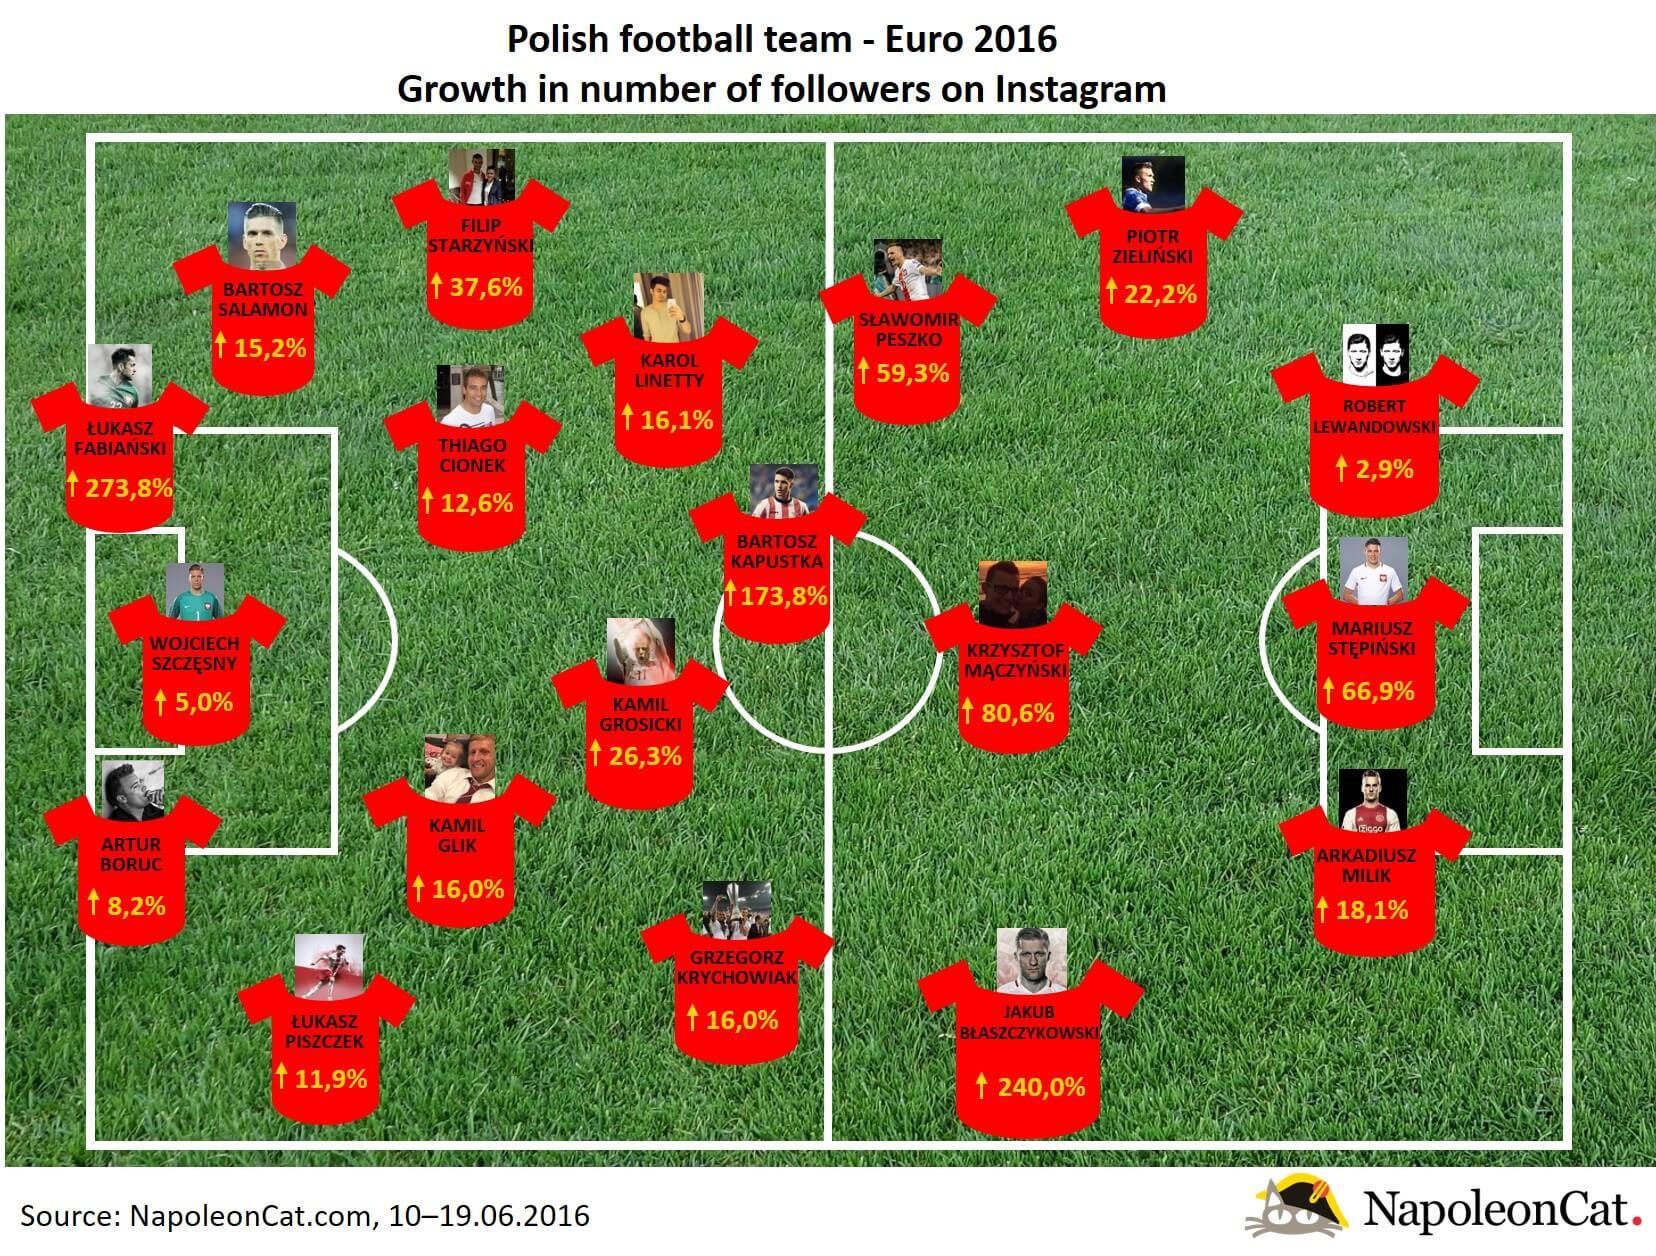 polish football team Euro 2016_growth of followers on Instagram_NapoleonCat.com